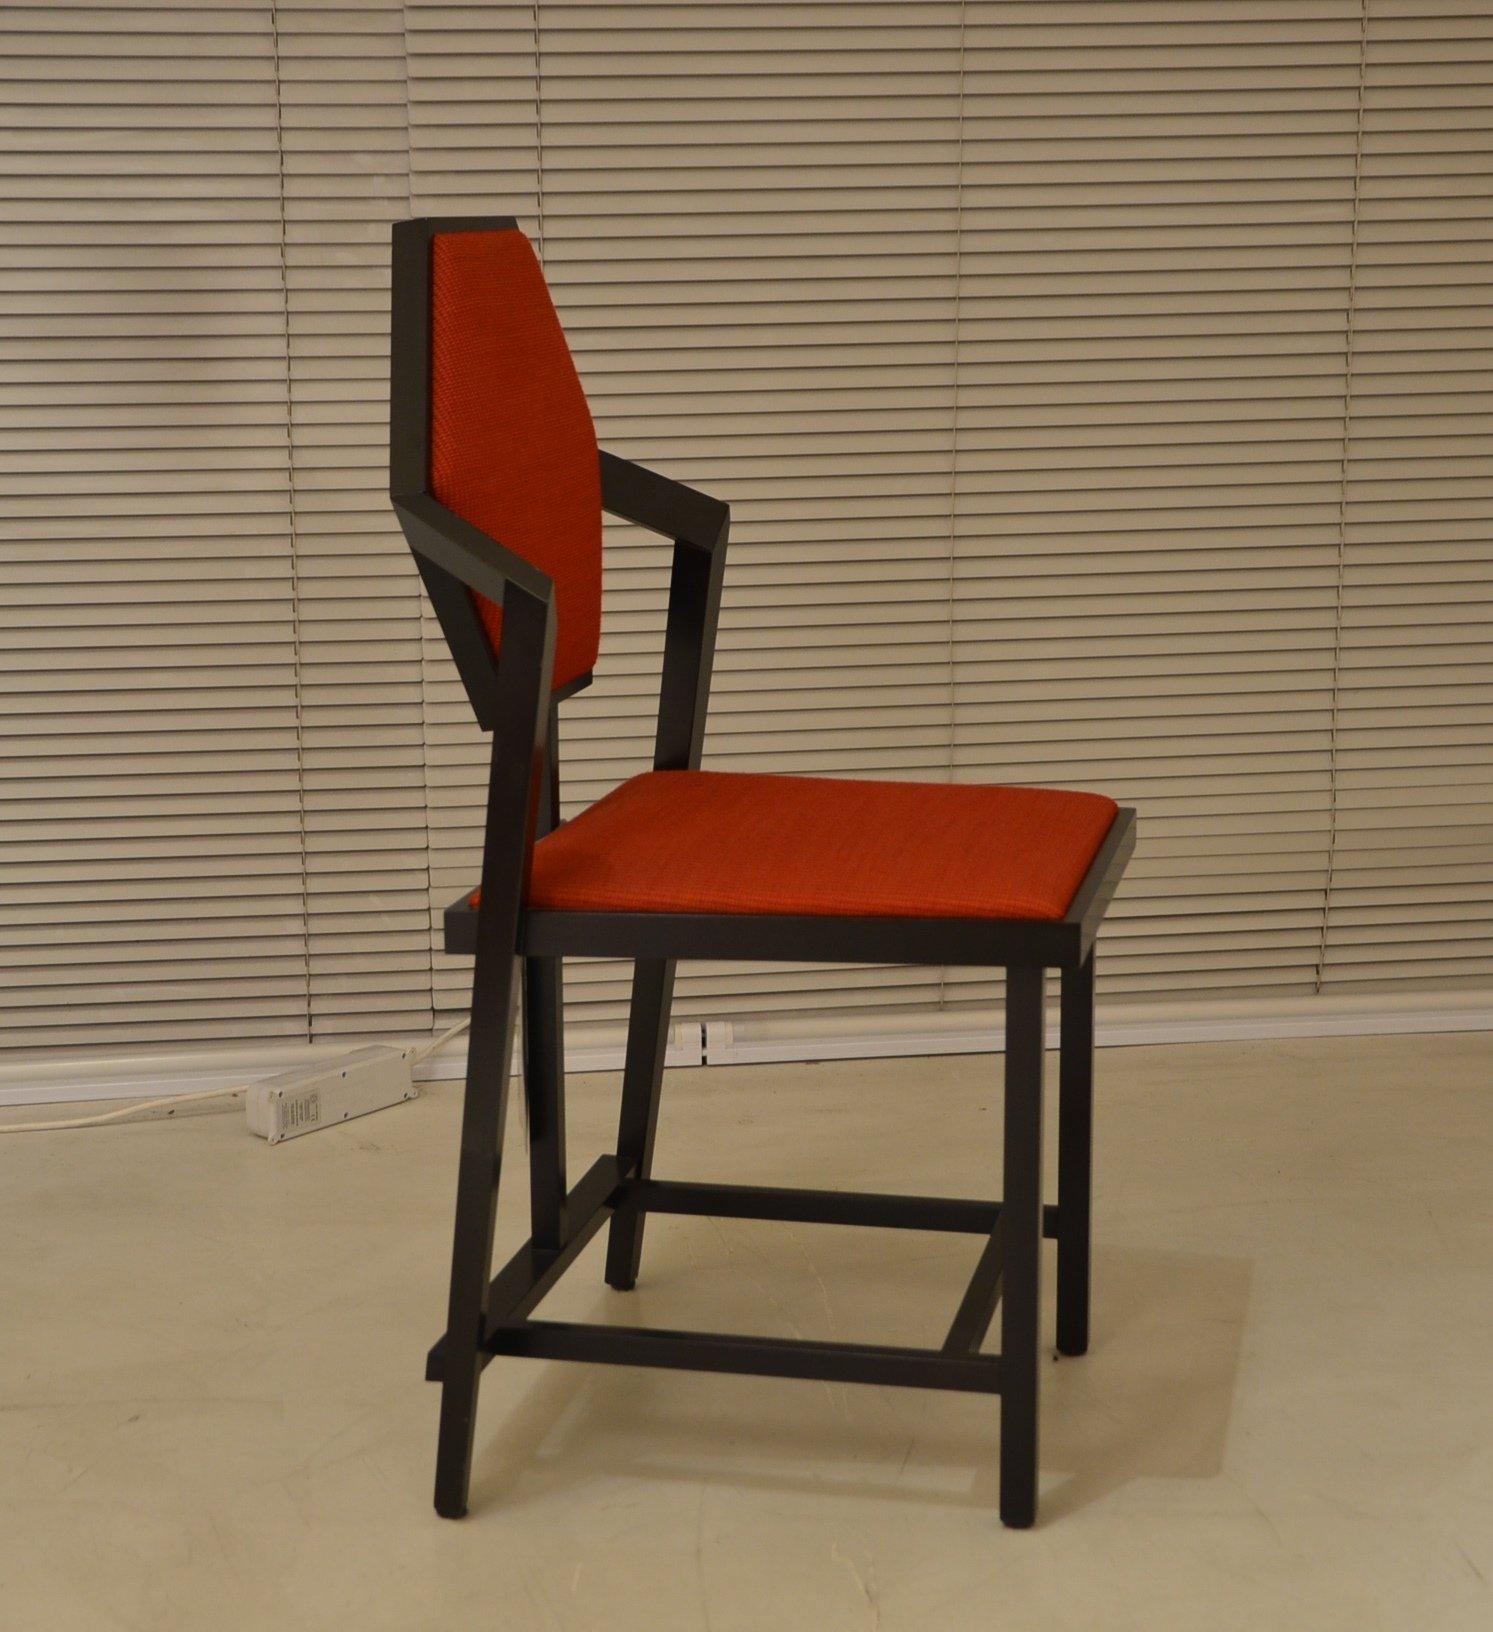 MIDWAY 1 Frank Lloyd Wright Cassina 오리지널 의자 디자인 이태리에서 만듦